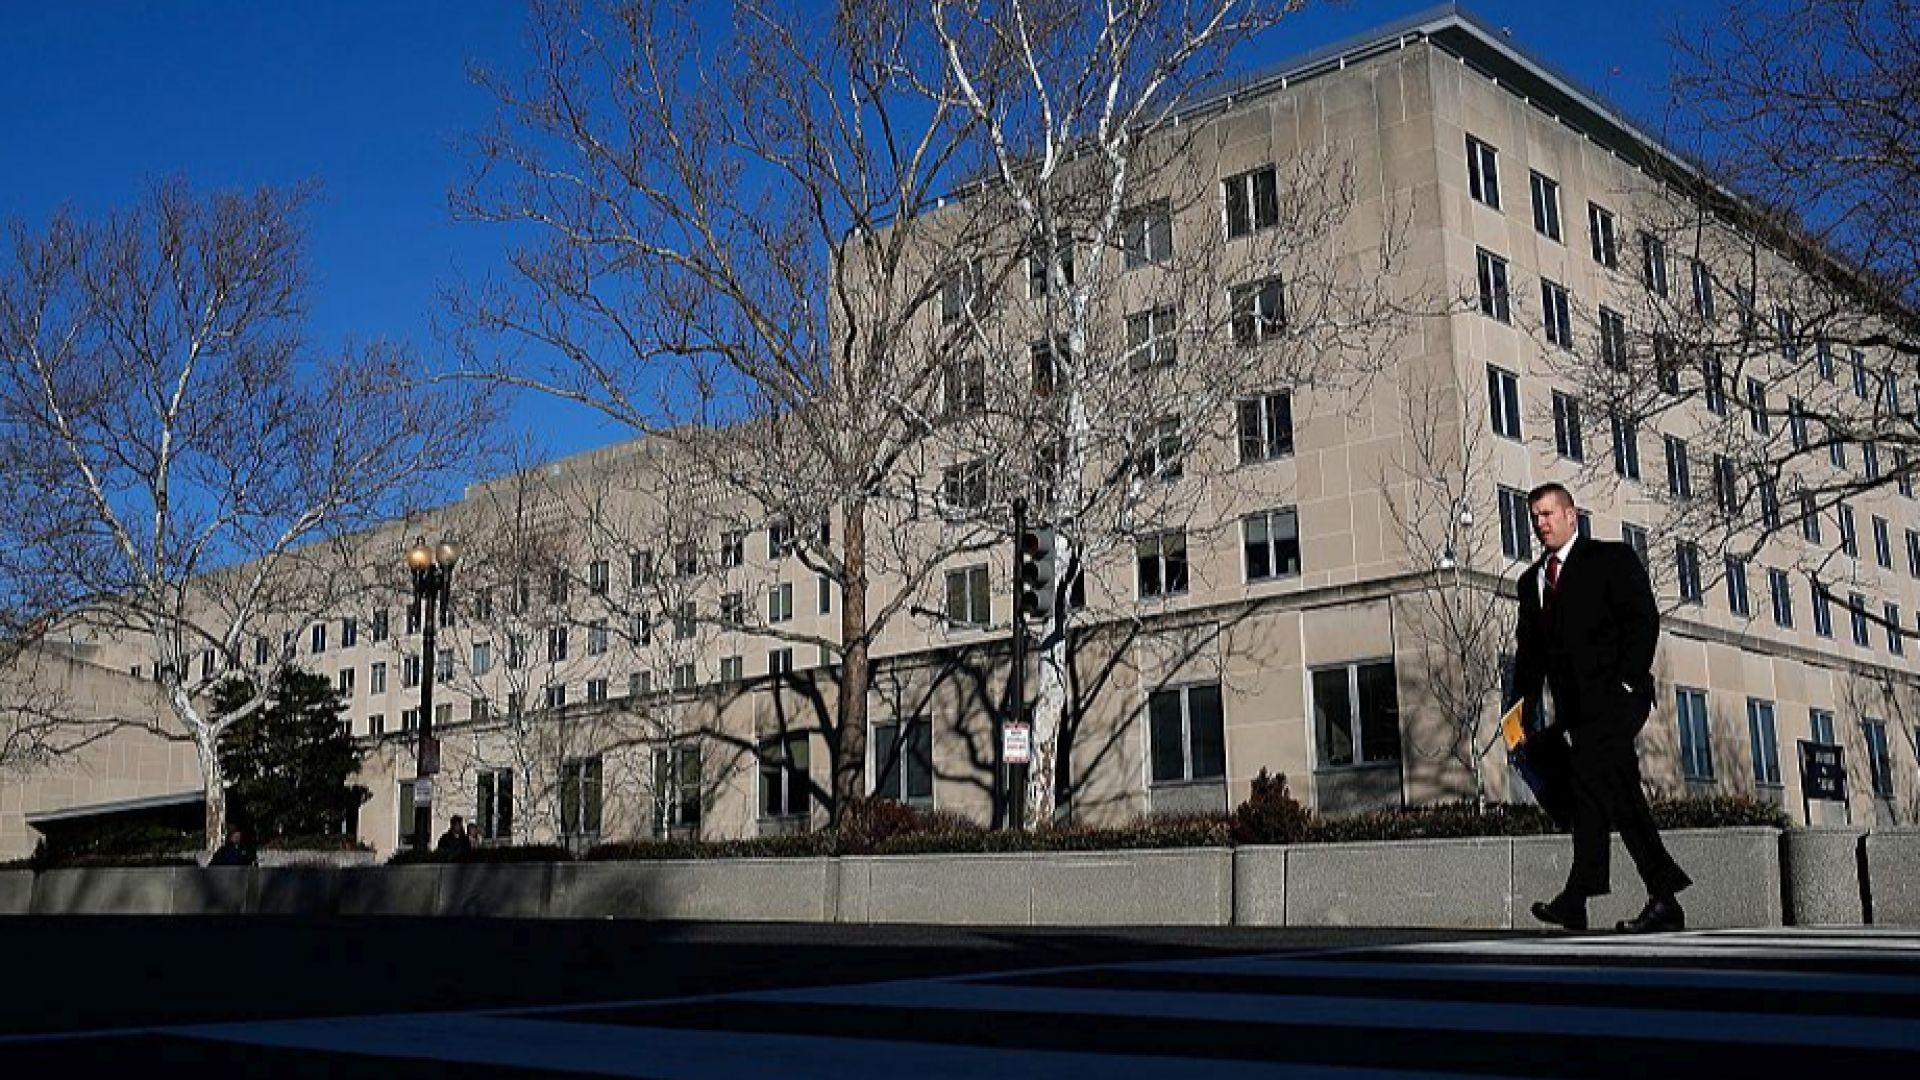 Нови загадъчни случаи с болни американски дипломати